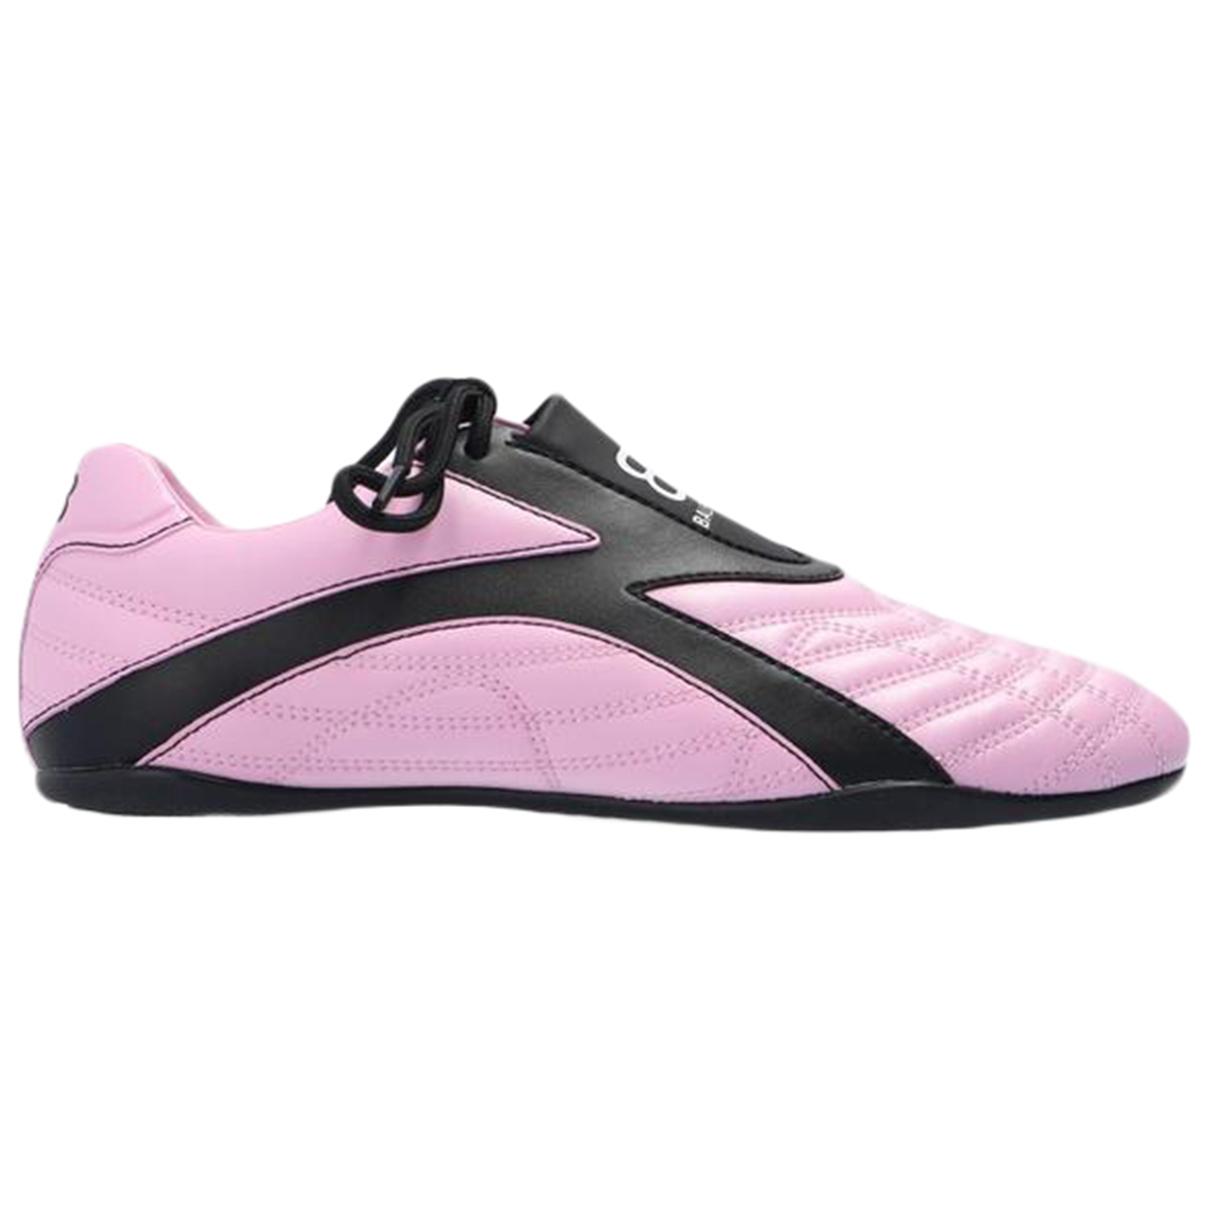 Balenciaga - Baskets   pour femme en cuir - rose